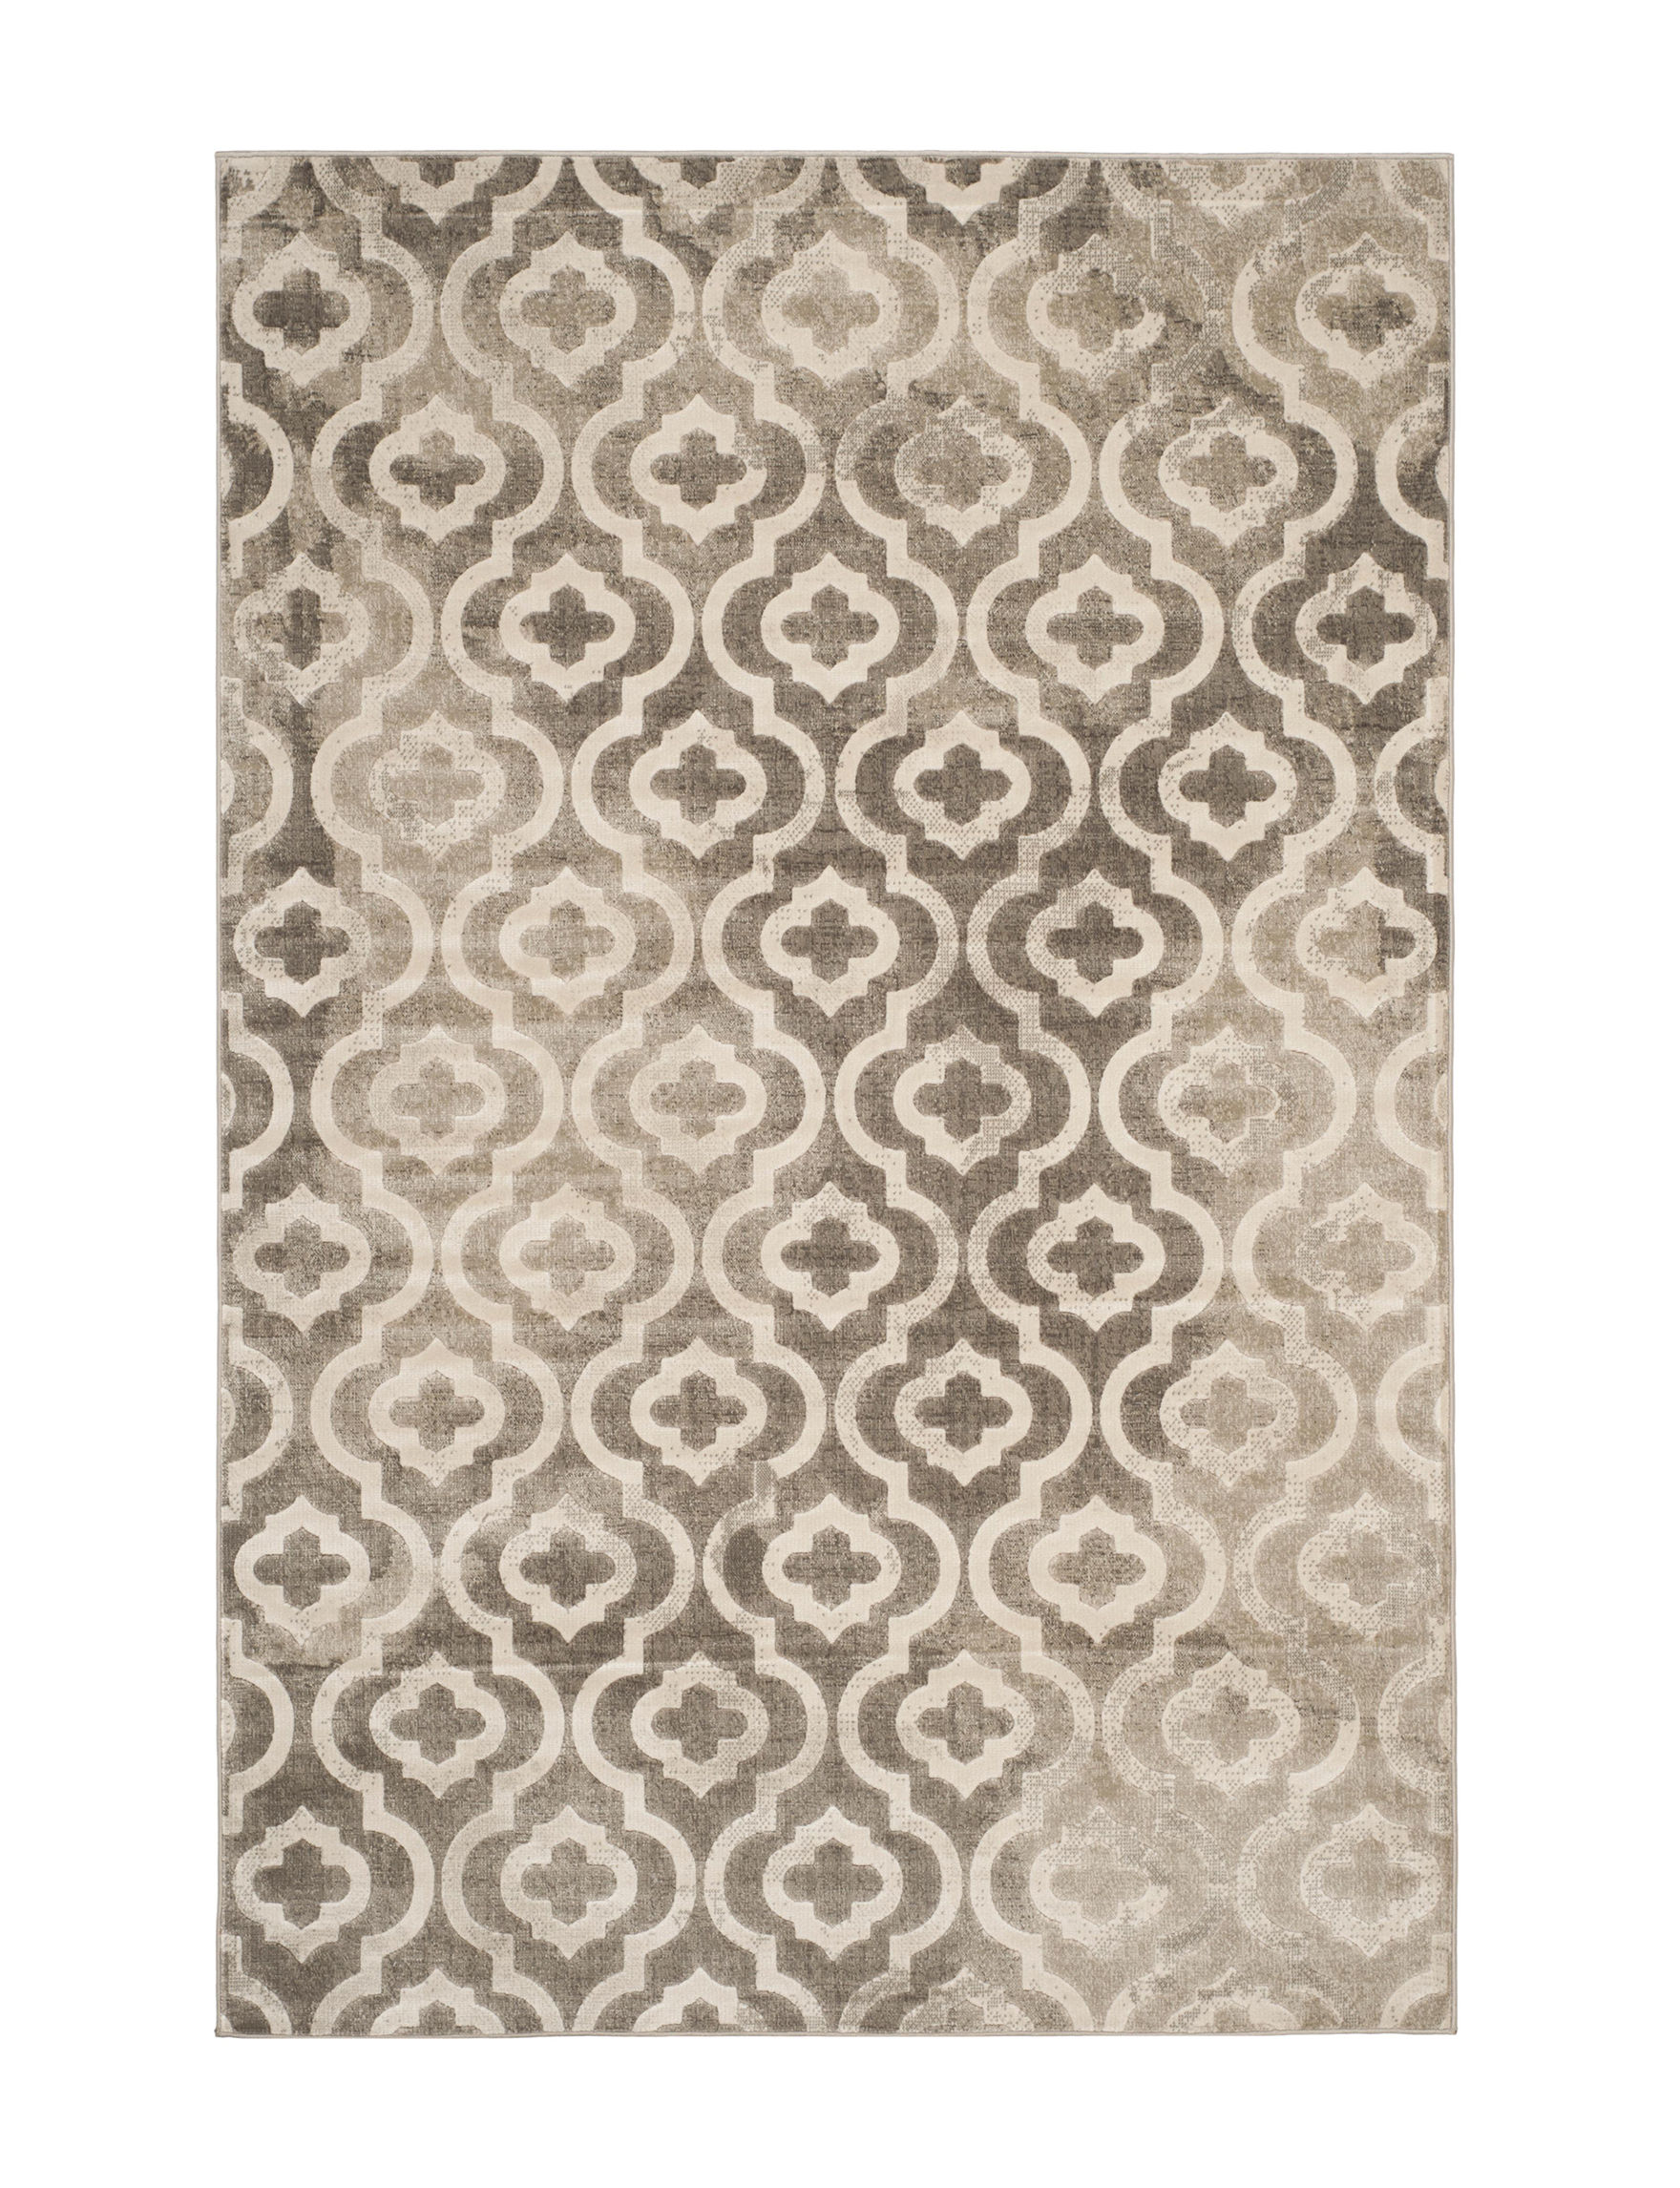 Safavieh Grey / Ivory Rugs